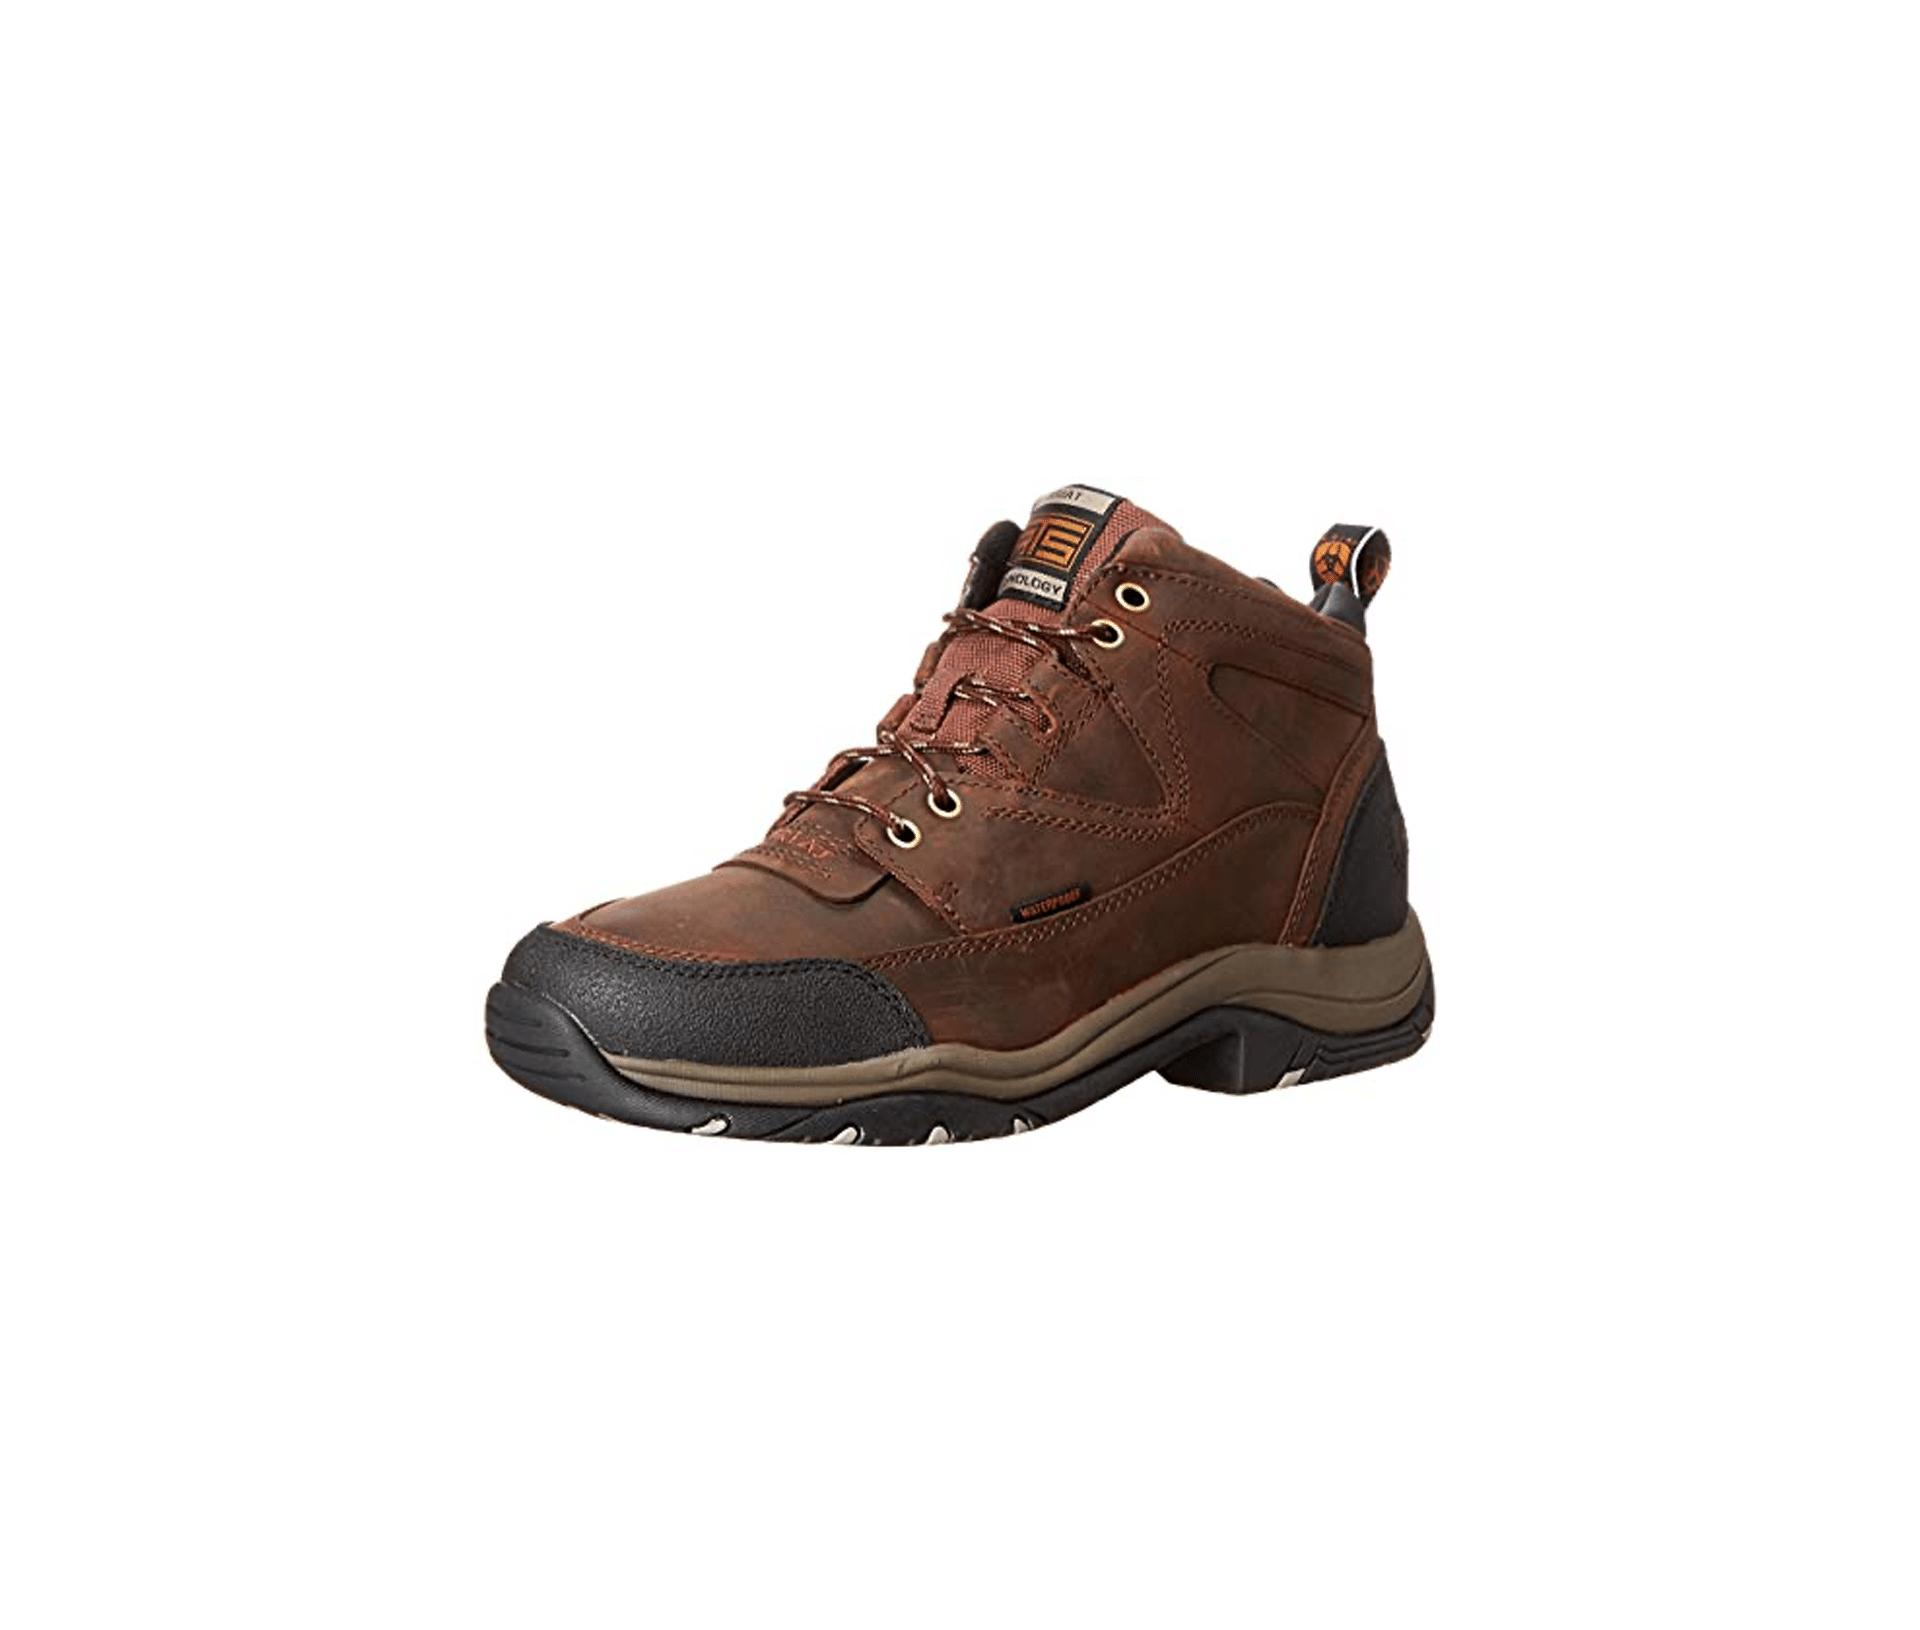 Ariat Men's Terrain H2O Hiking Boot